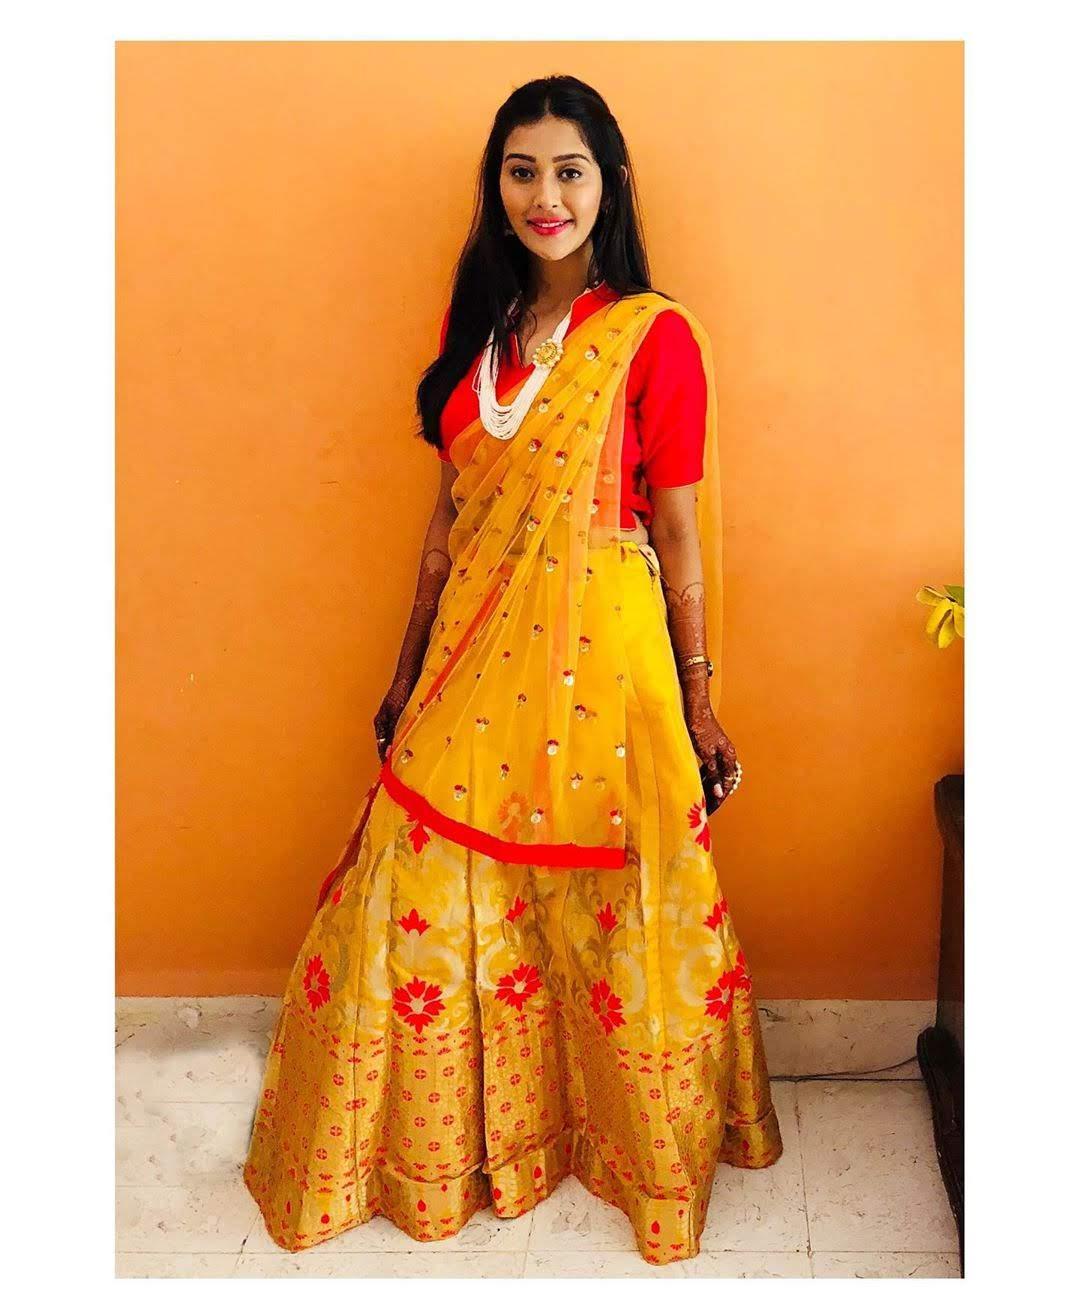 Pooja-Jhaveri-611689